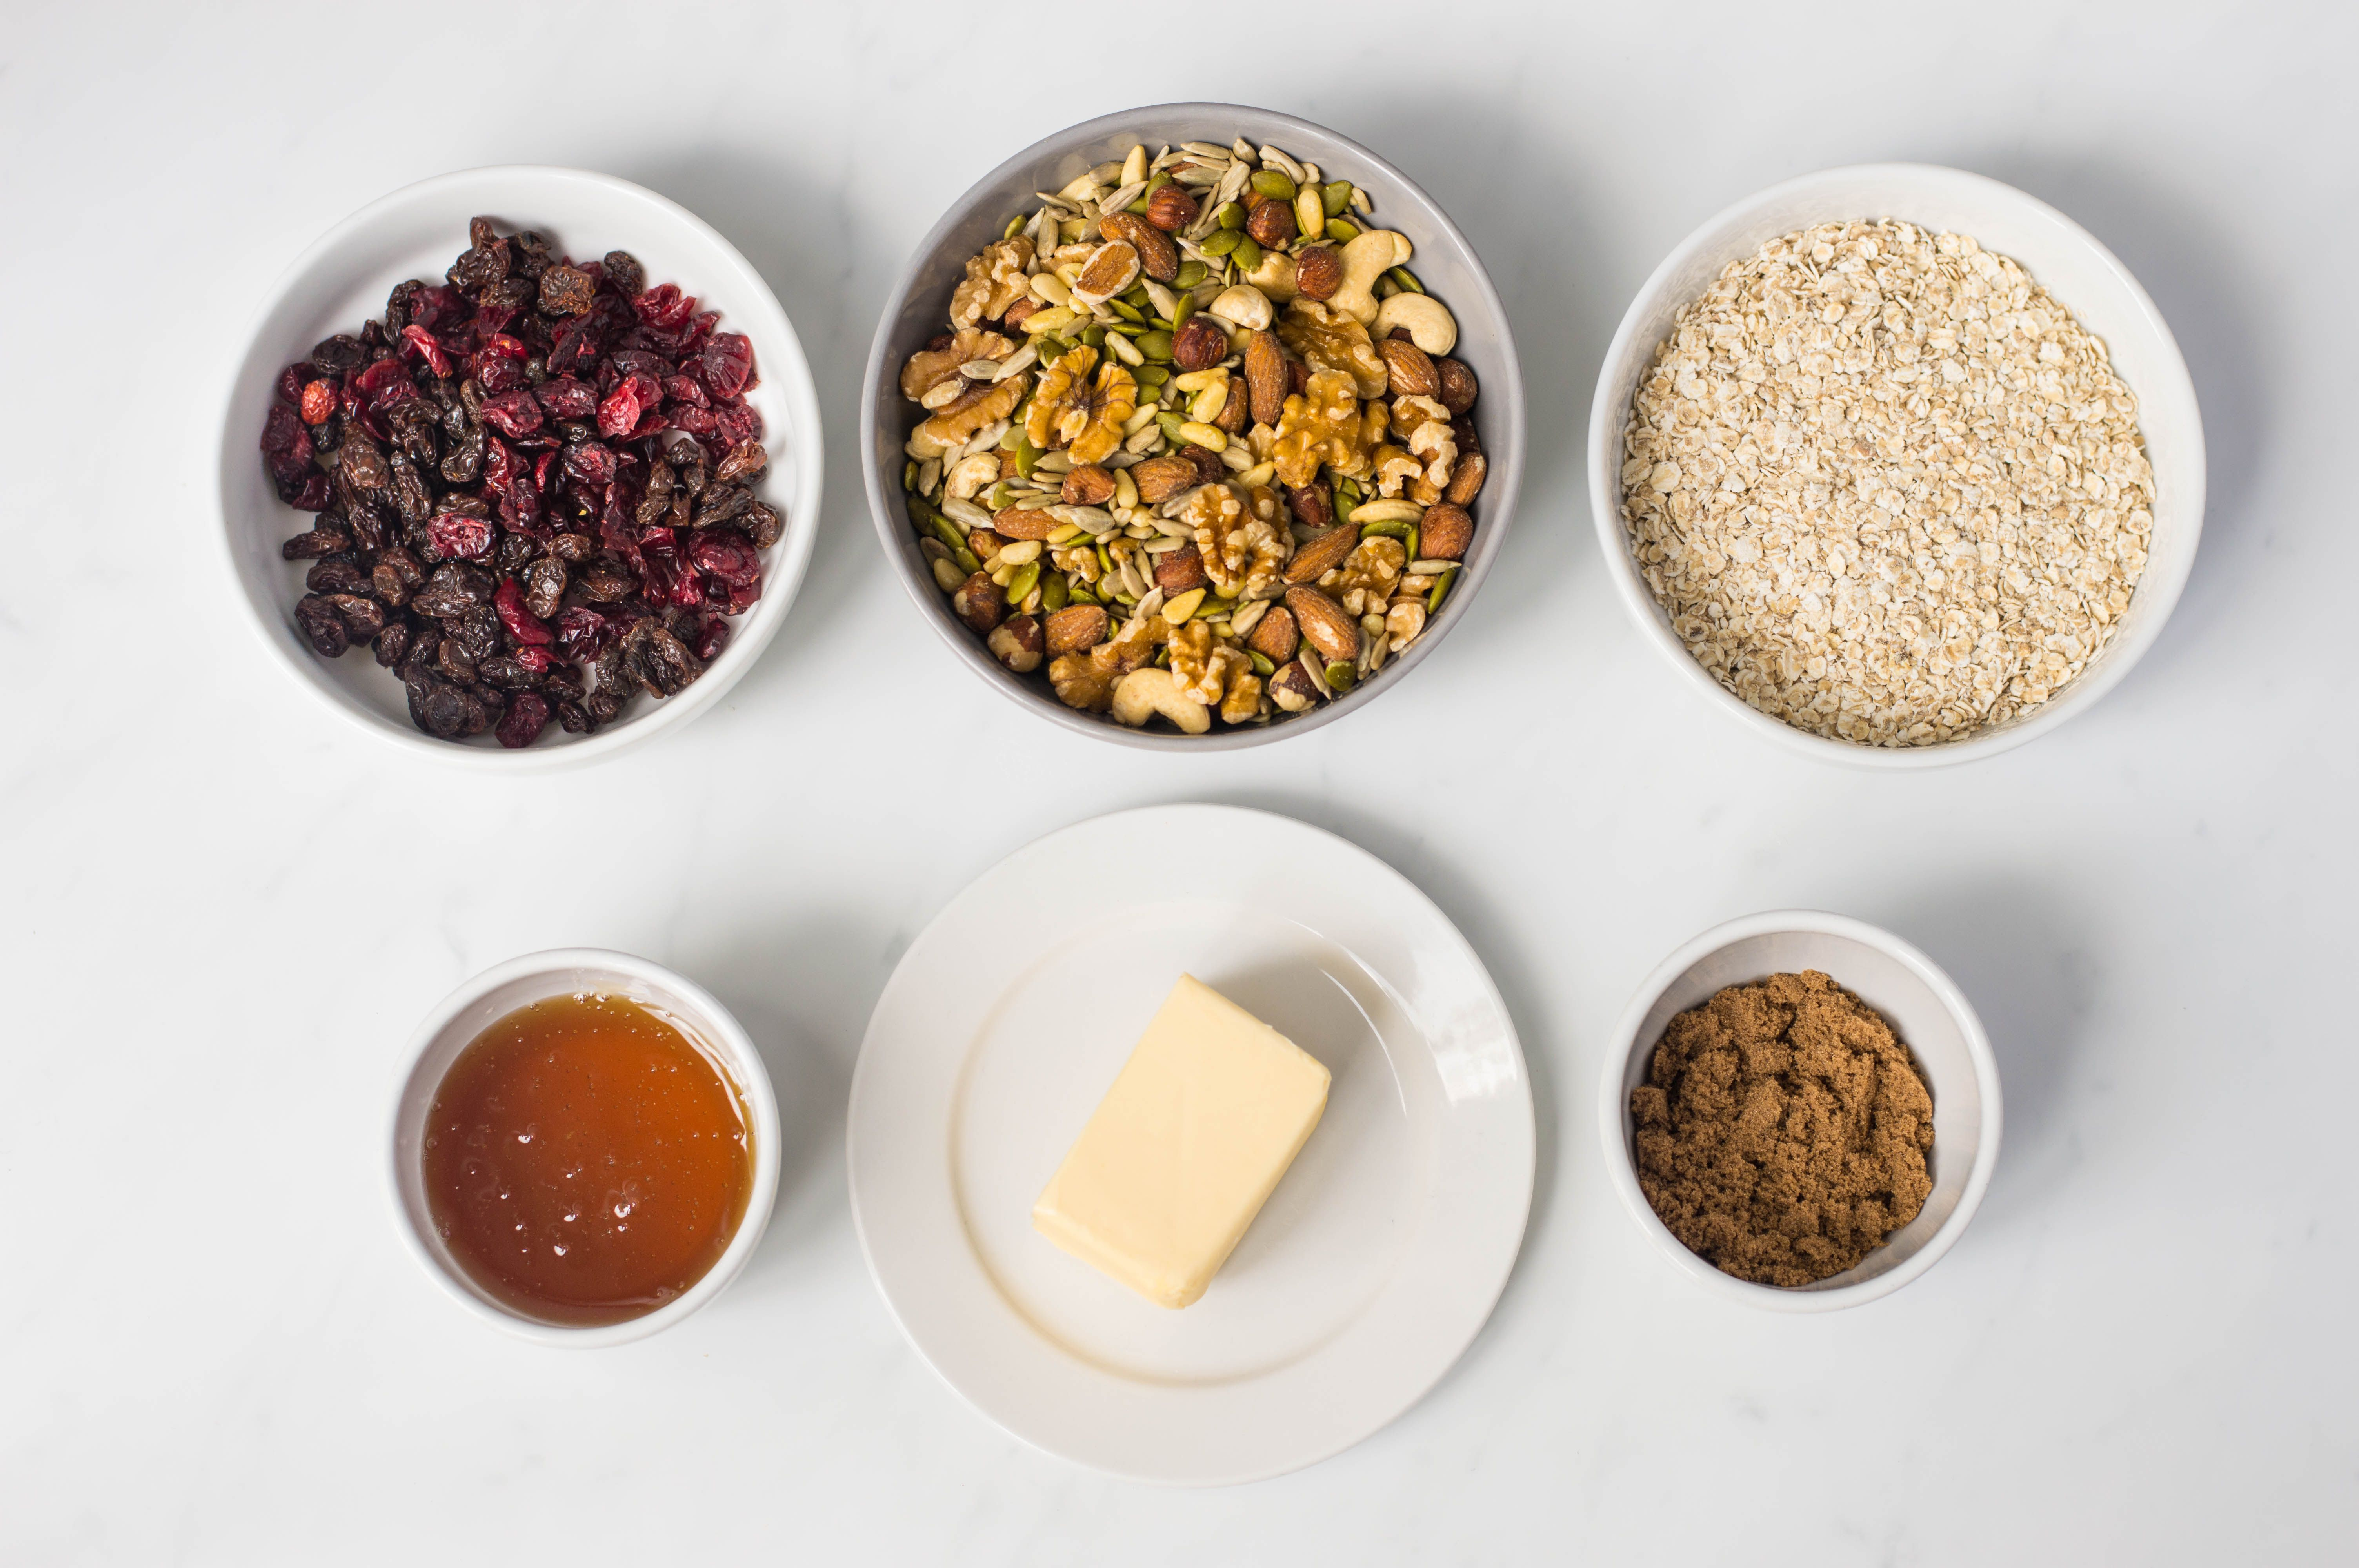 Easy and Healthy Muesli Flapjack Bars Recipe